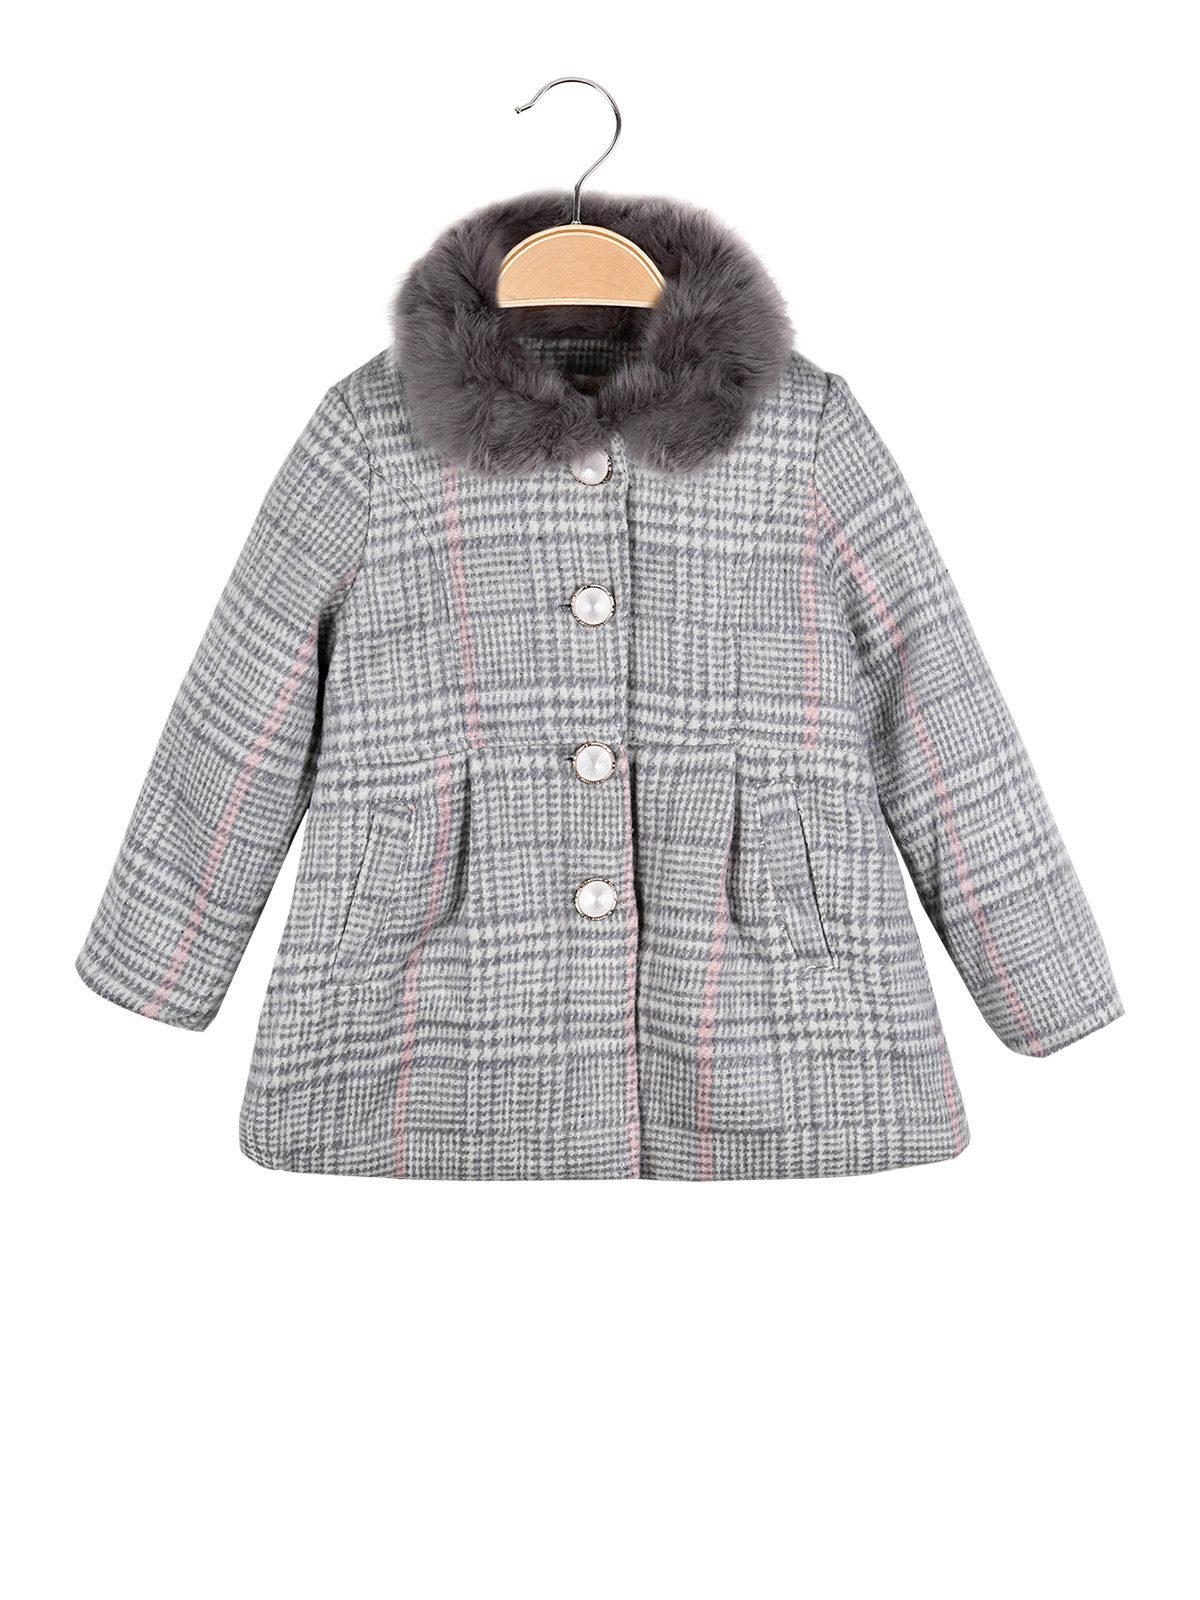 save off 0a8e1 d4621 Cappotto grigio scozzese mono star | MecShopping